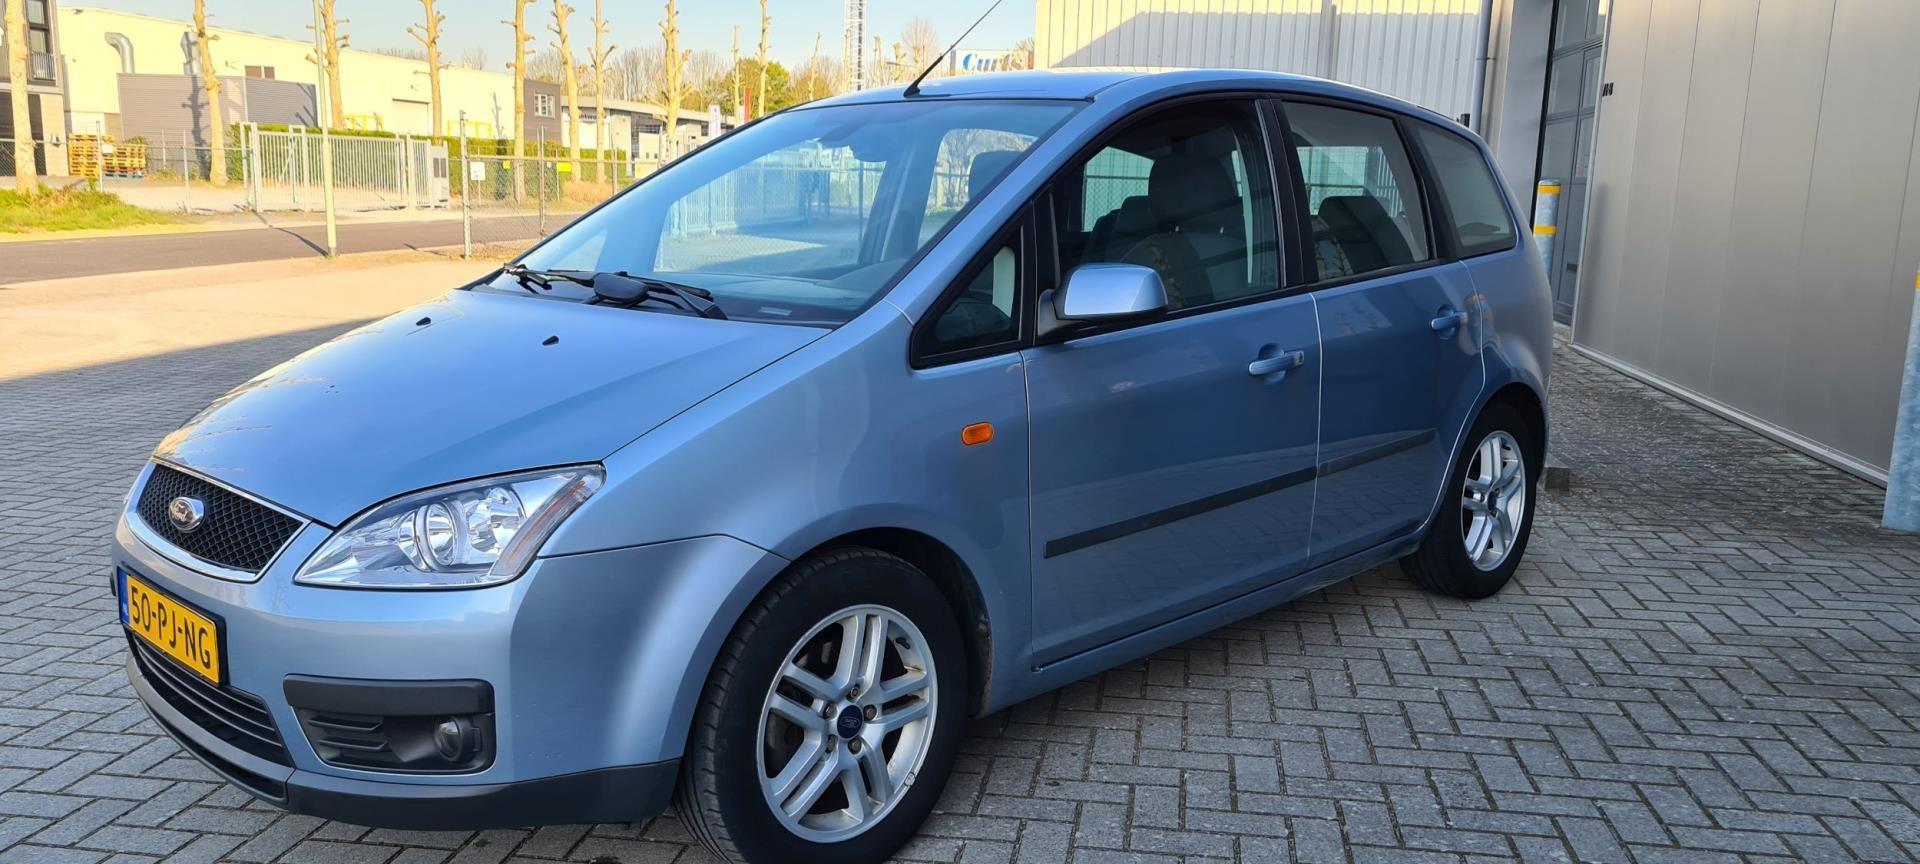 Ford Focus C-Max occasion - Weerterveld Auto's